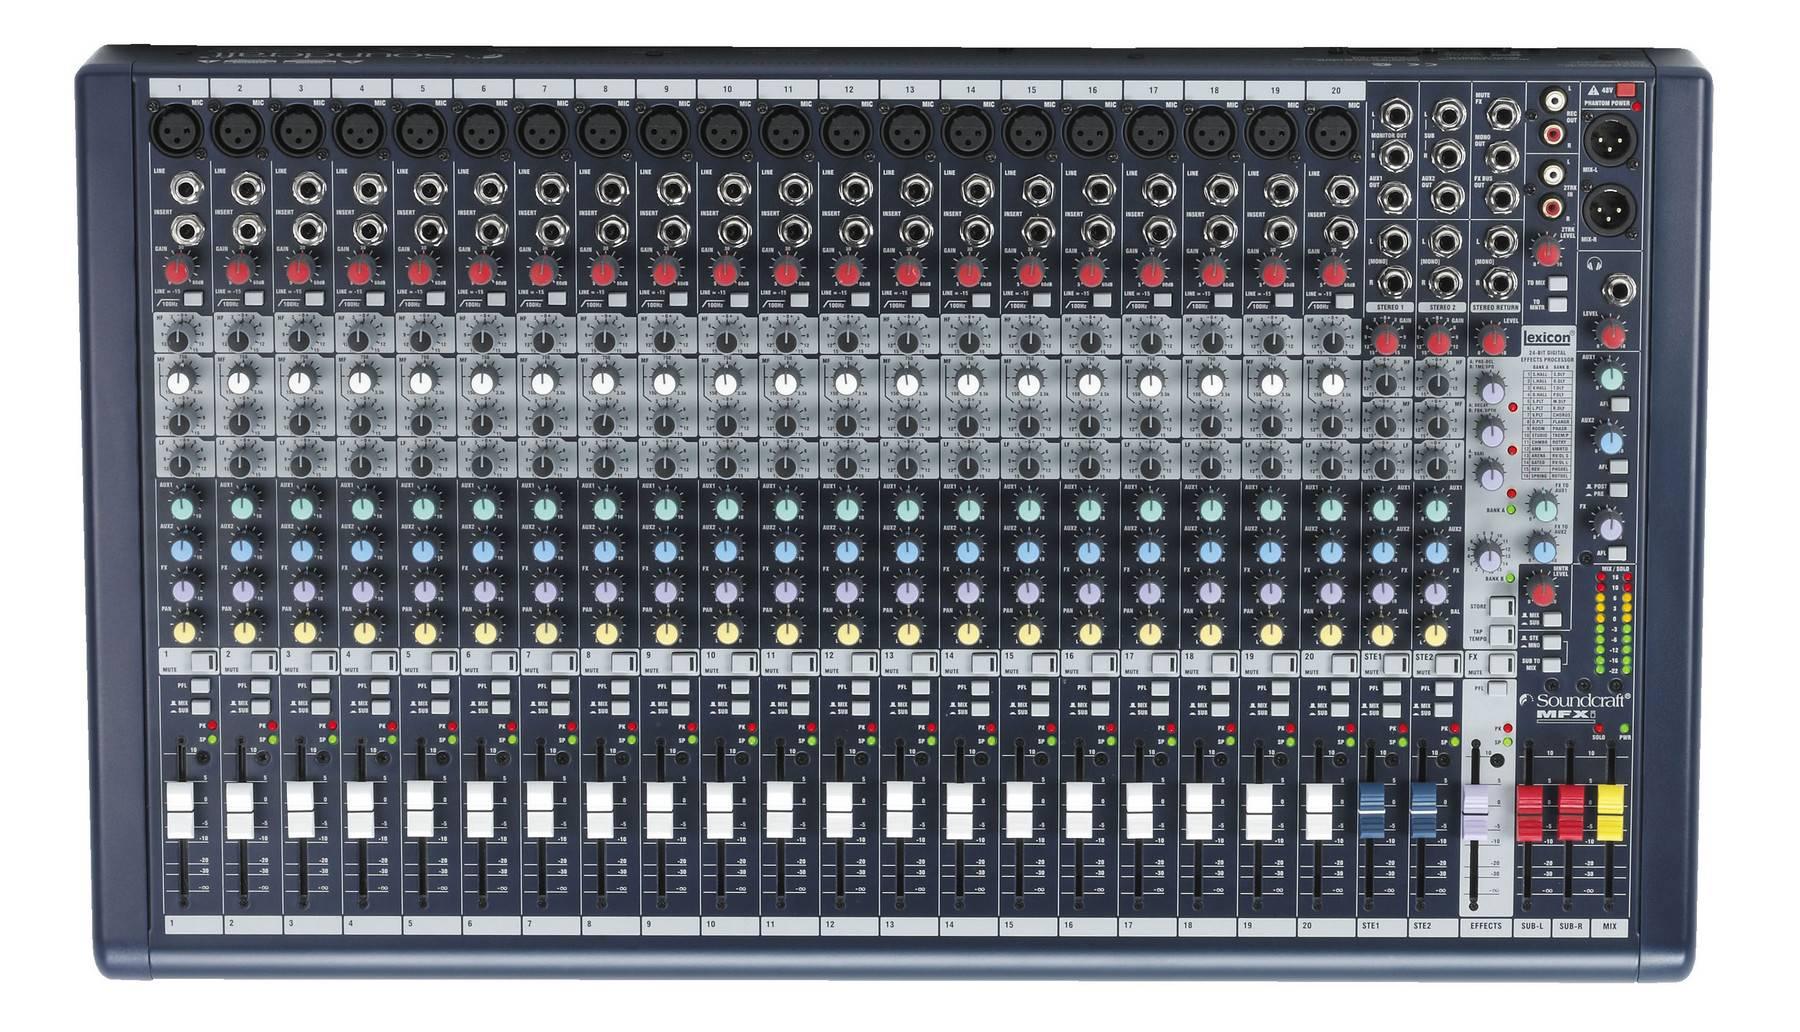 Mixer peavay xr1212 giá tốt nhất